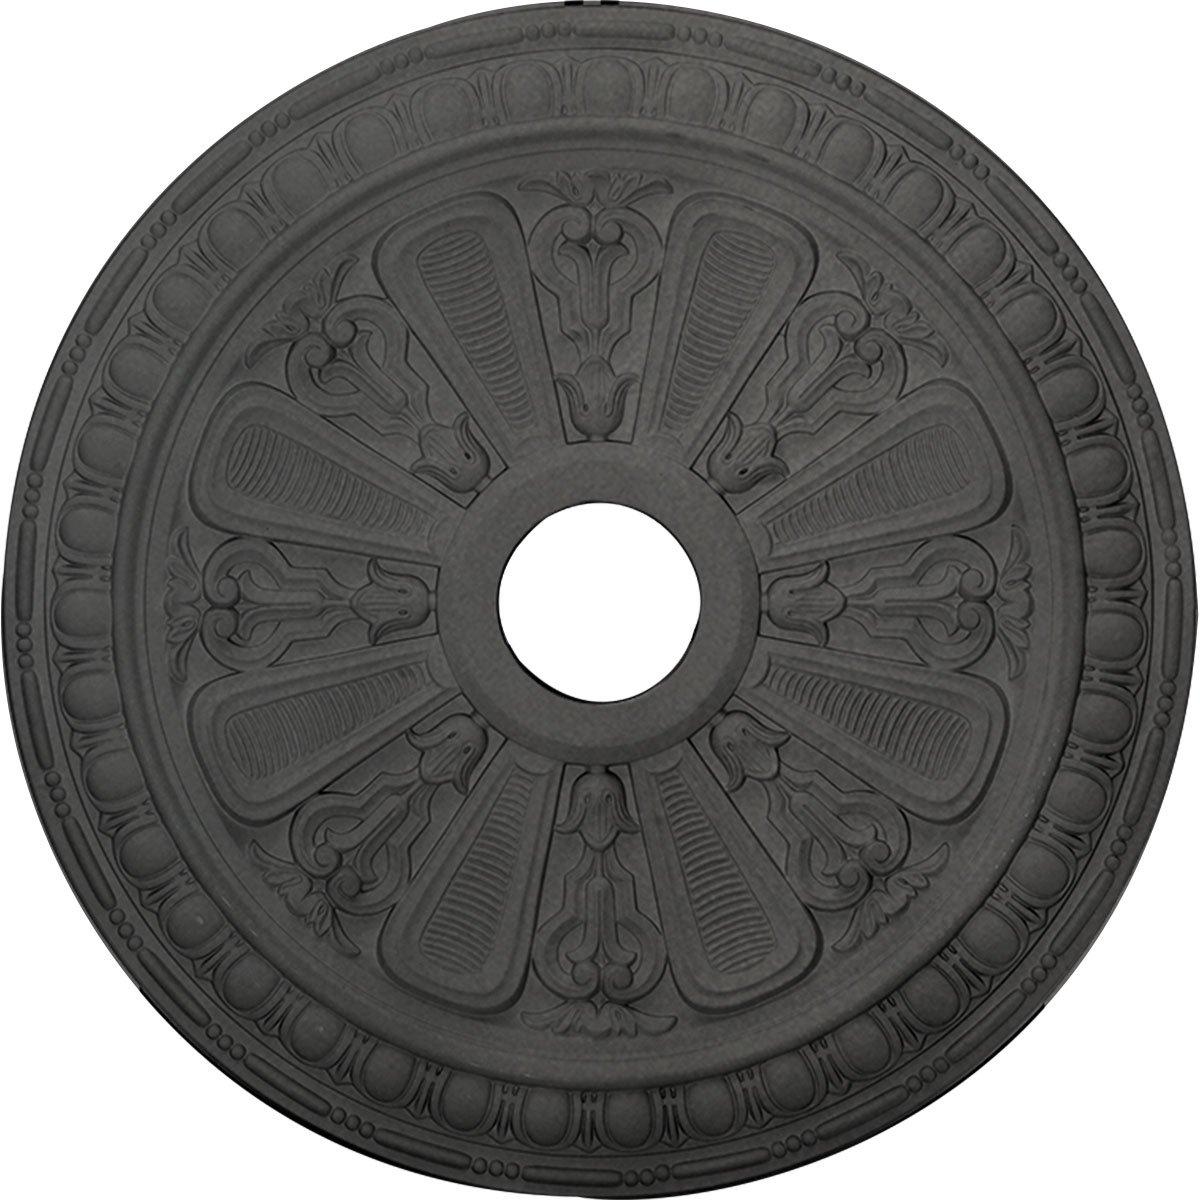 Ekena Millwork CM23BISGS 23 1/2'' OD x 3 7/8'' ID x 1'' P Bristol Ceiling Medallion fits Canopies up to 3, Steel Gray